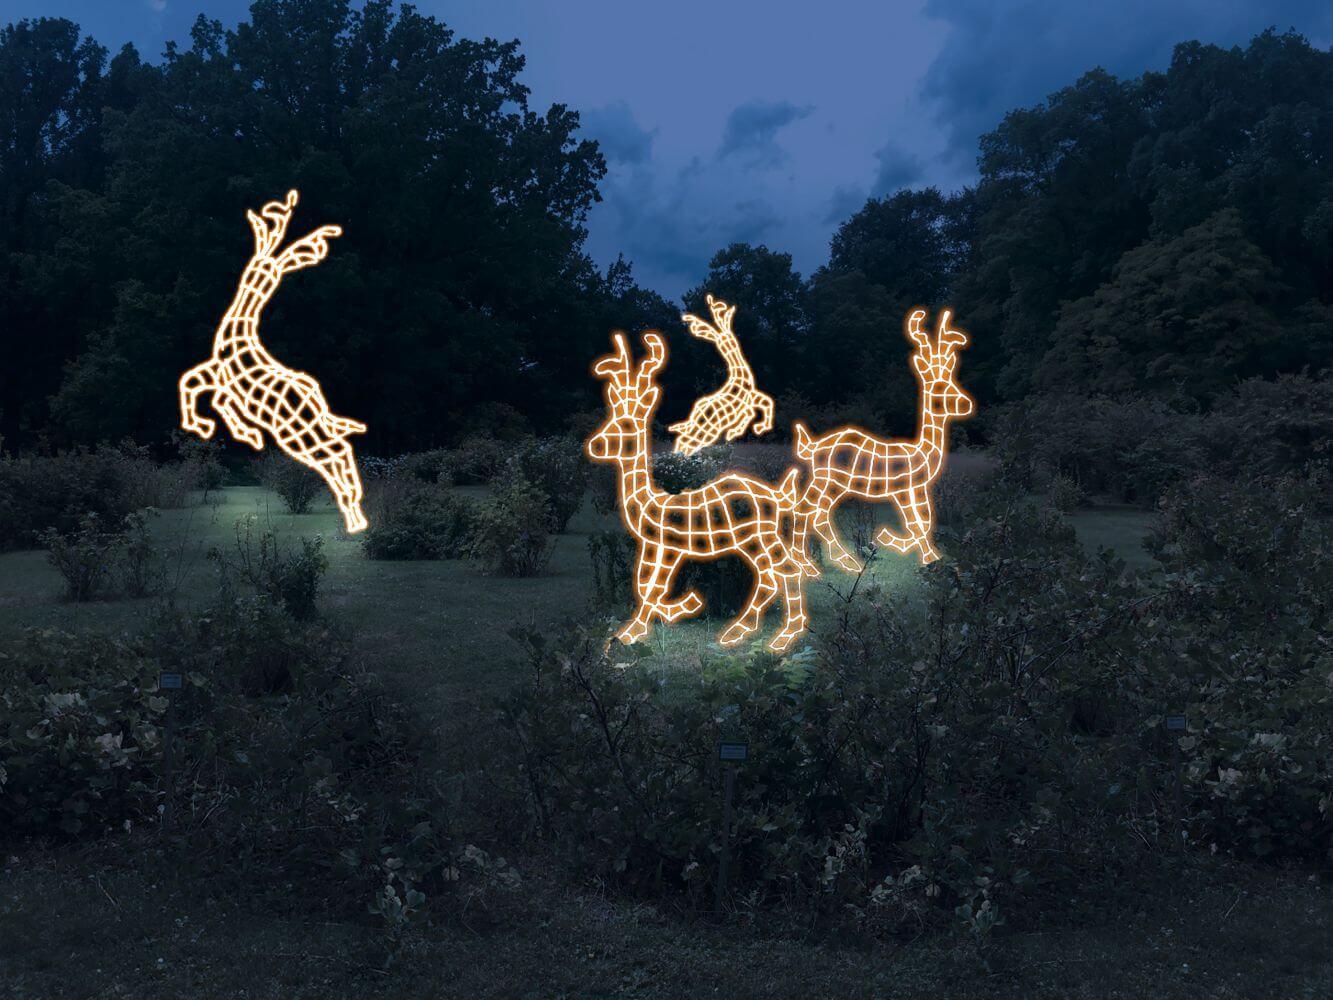 Leuchtende Rentiere Christmas Garden Berlin